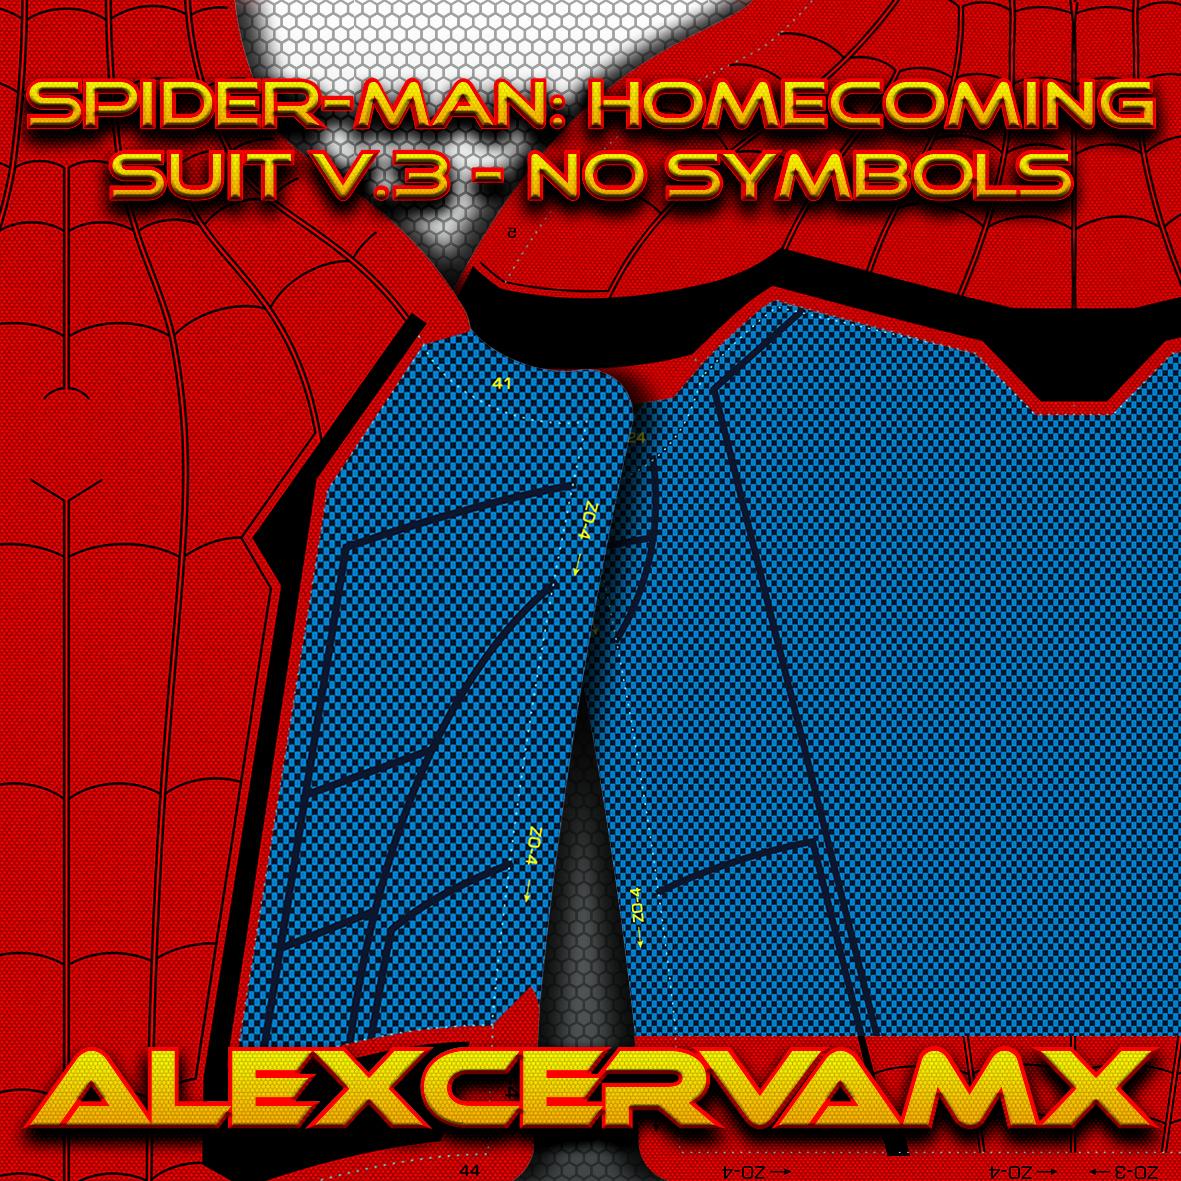 AlexCerva's SM: Homecoming v3 Dye-Sub Pattern (No Symbols)